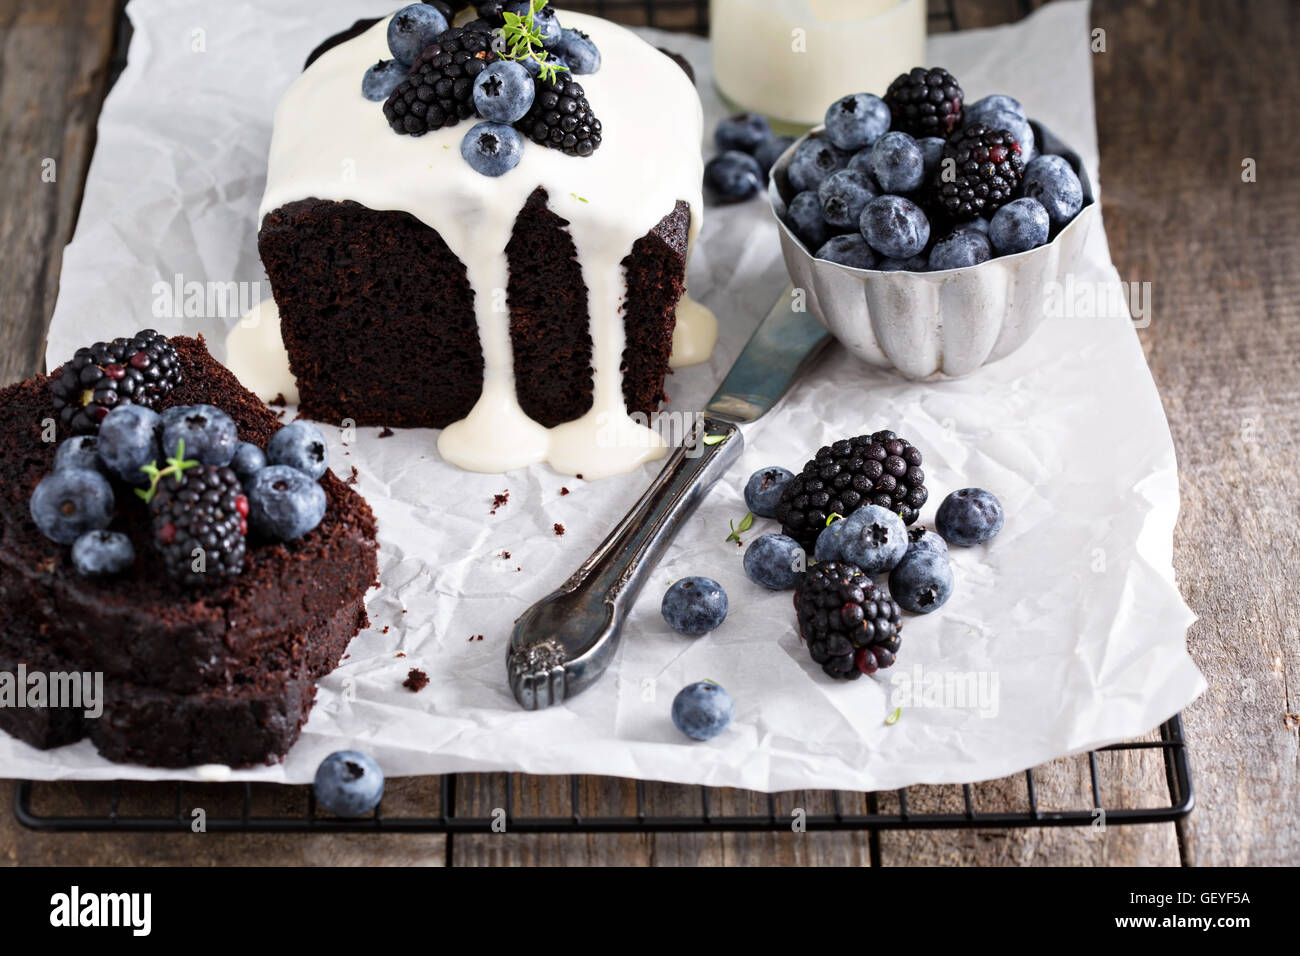 Chocolate loaf cake with thick yogurt glaze - Stock Image